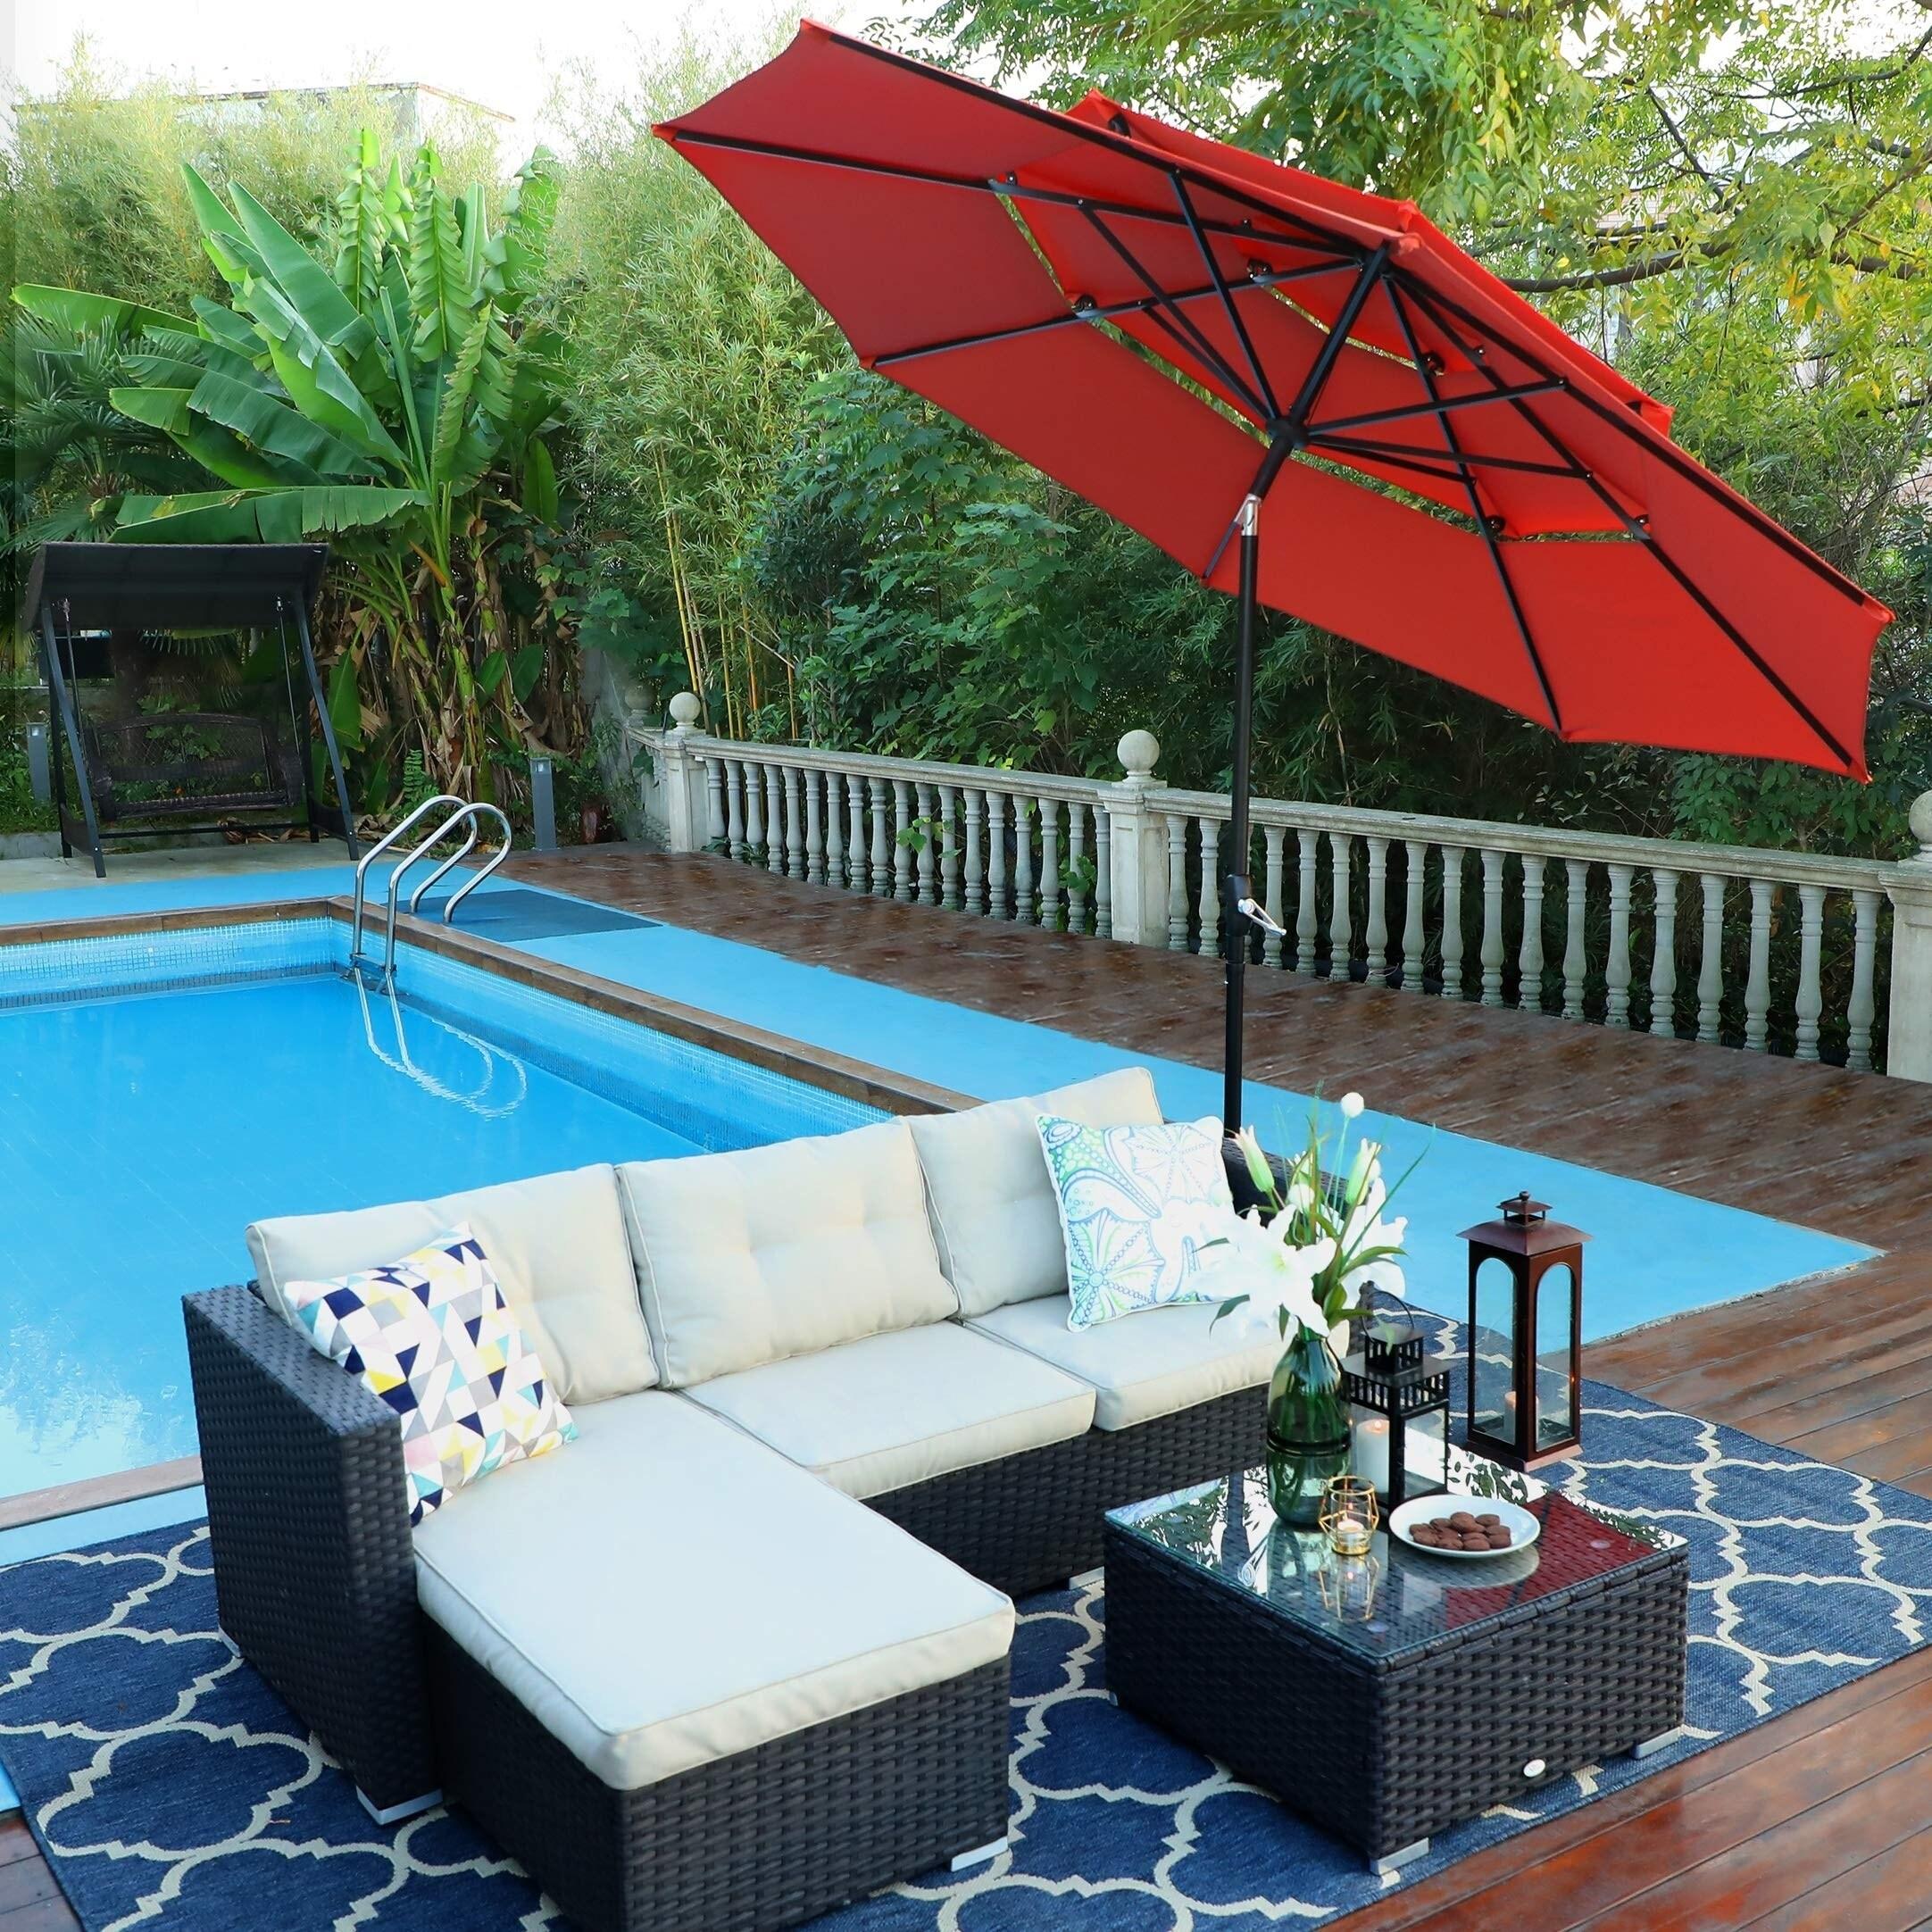 phi villa 10ft 3 tier auto tilt patio umbrella outdoor double vented umbrella orange red